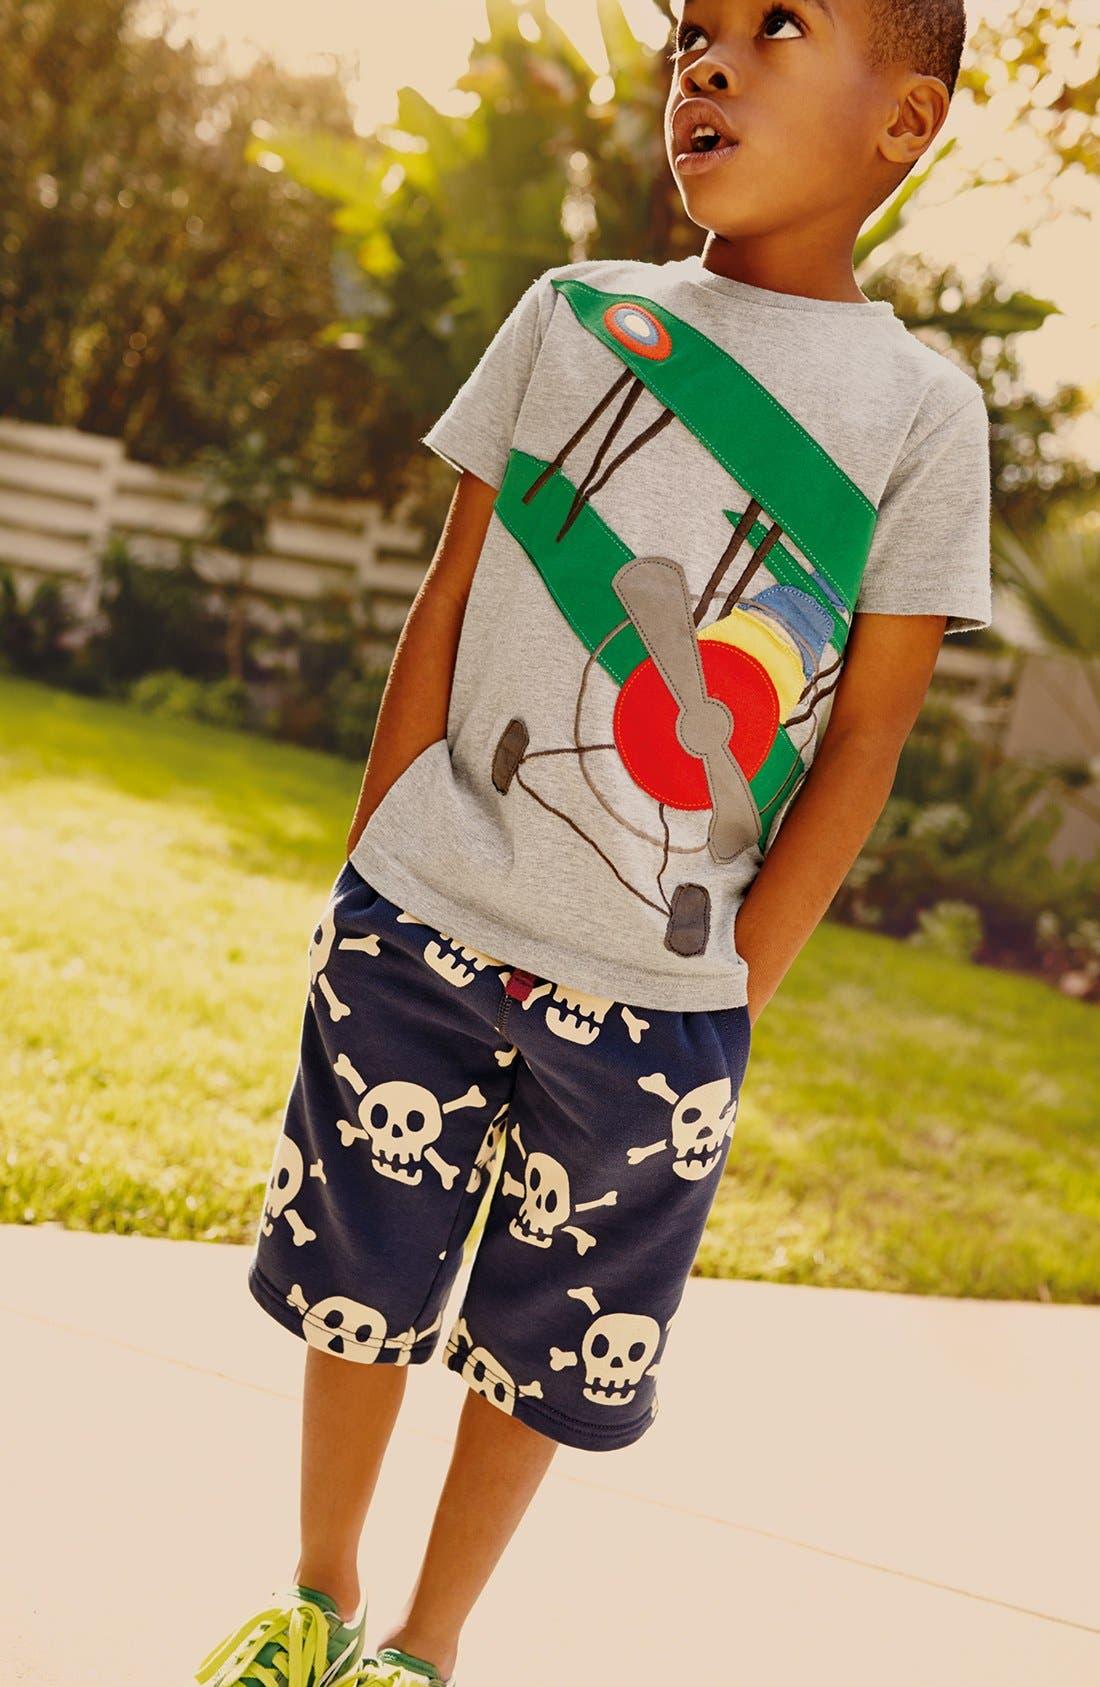 Alternate Image 1 Selected - Mini Boden T-Shirt & Knit Shorts (Toddler Boys, Little Boys & Big Boys)